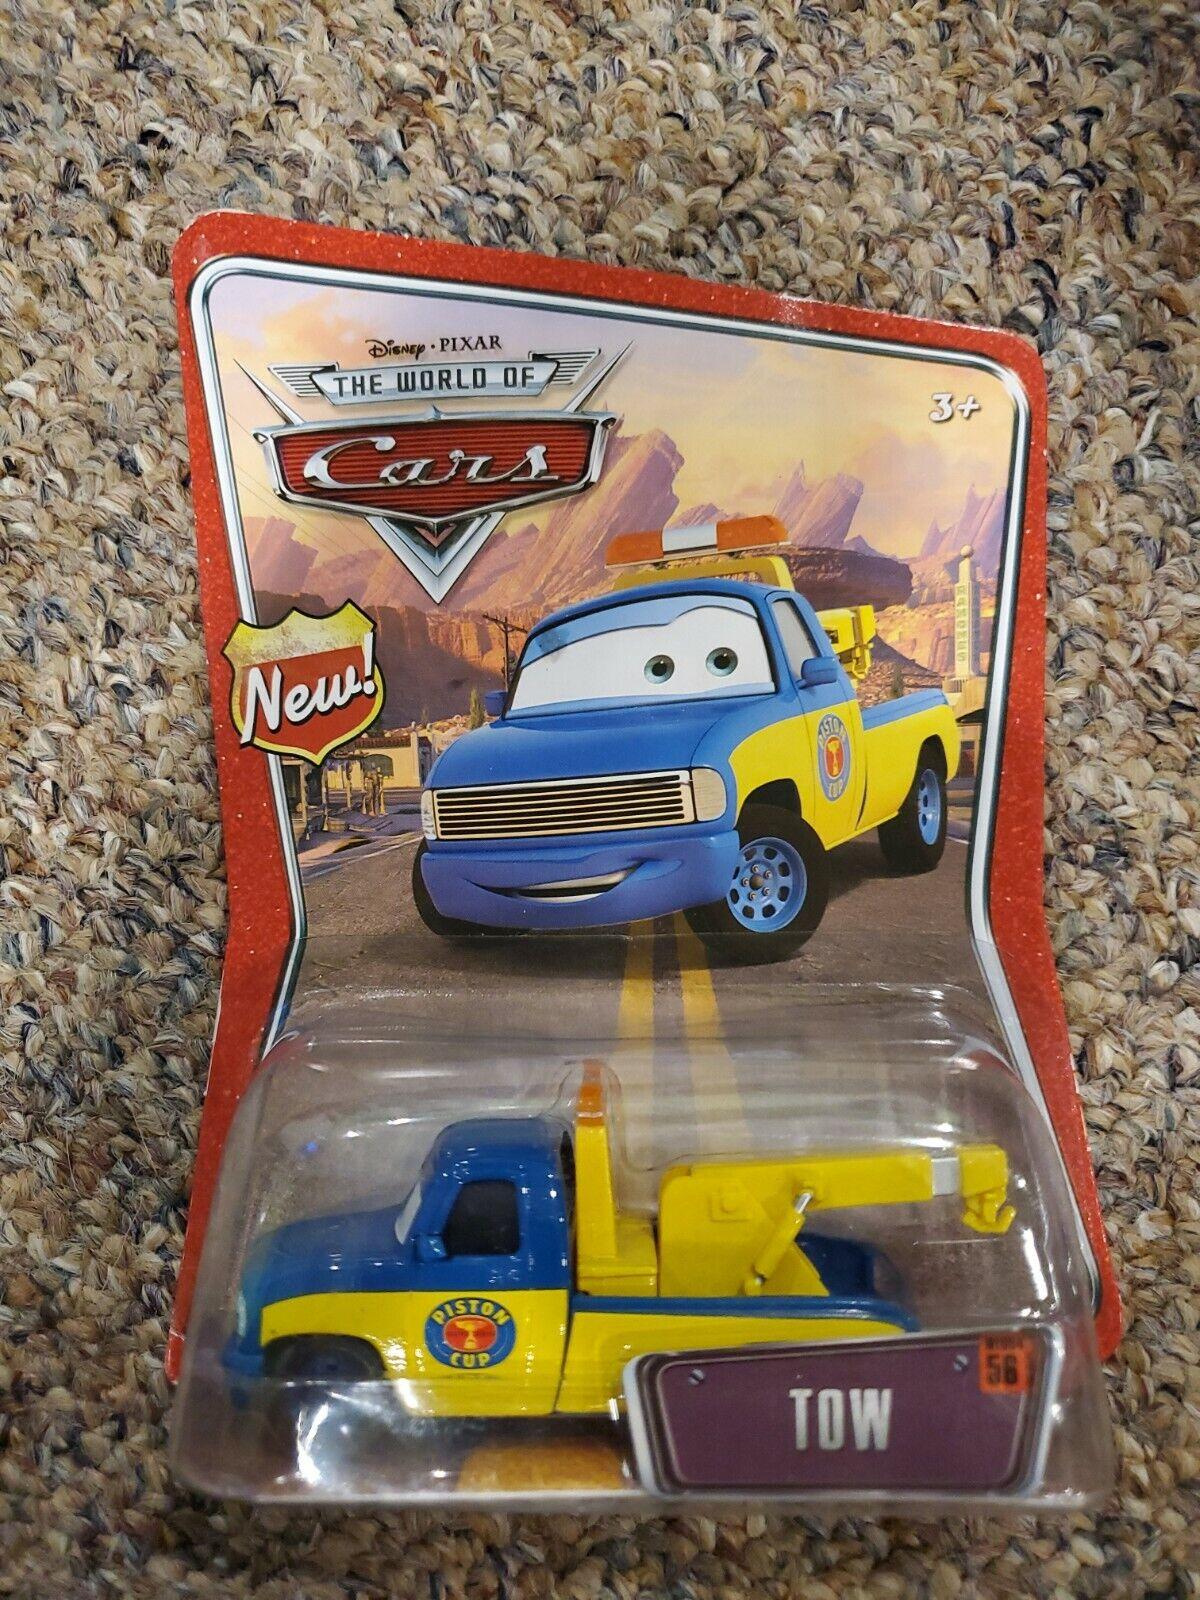 TOW #56 Disney Pixar Cars Diecast Truck 1:55 World WoC Tom Piston Cup M2320 NEW